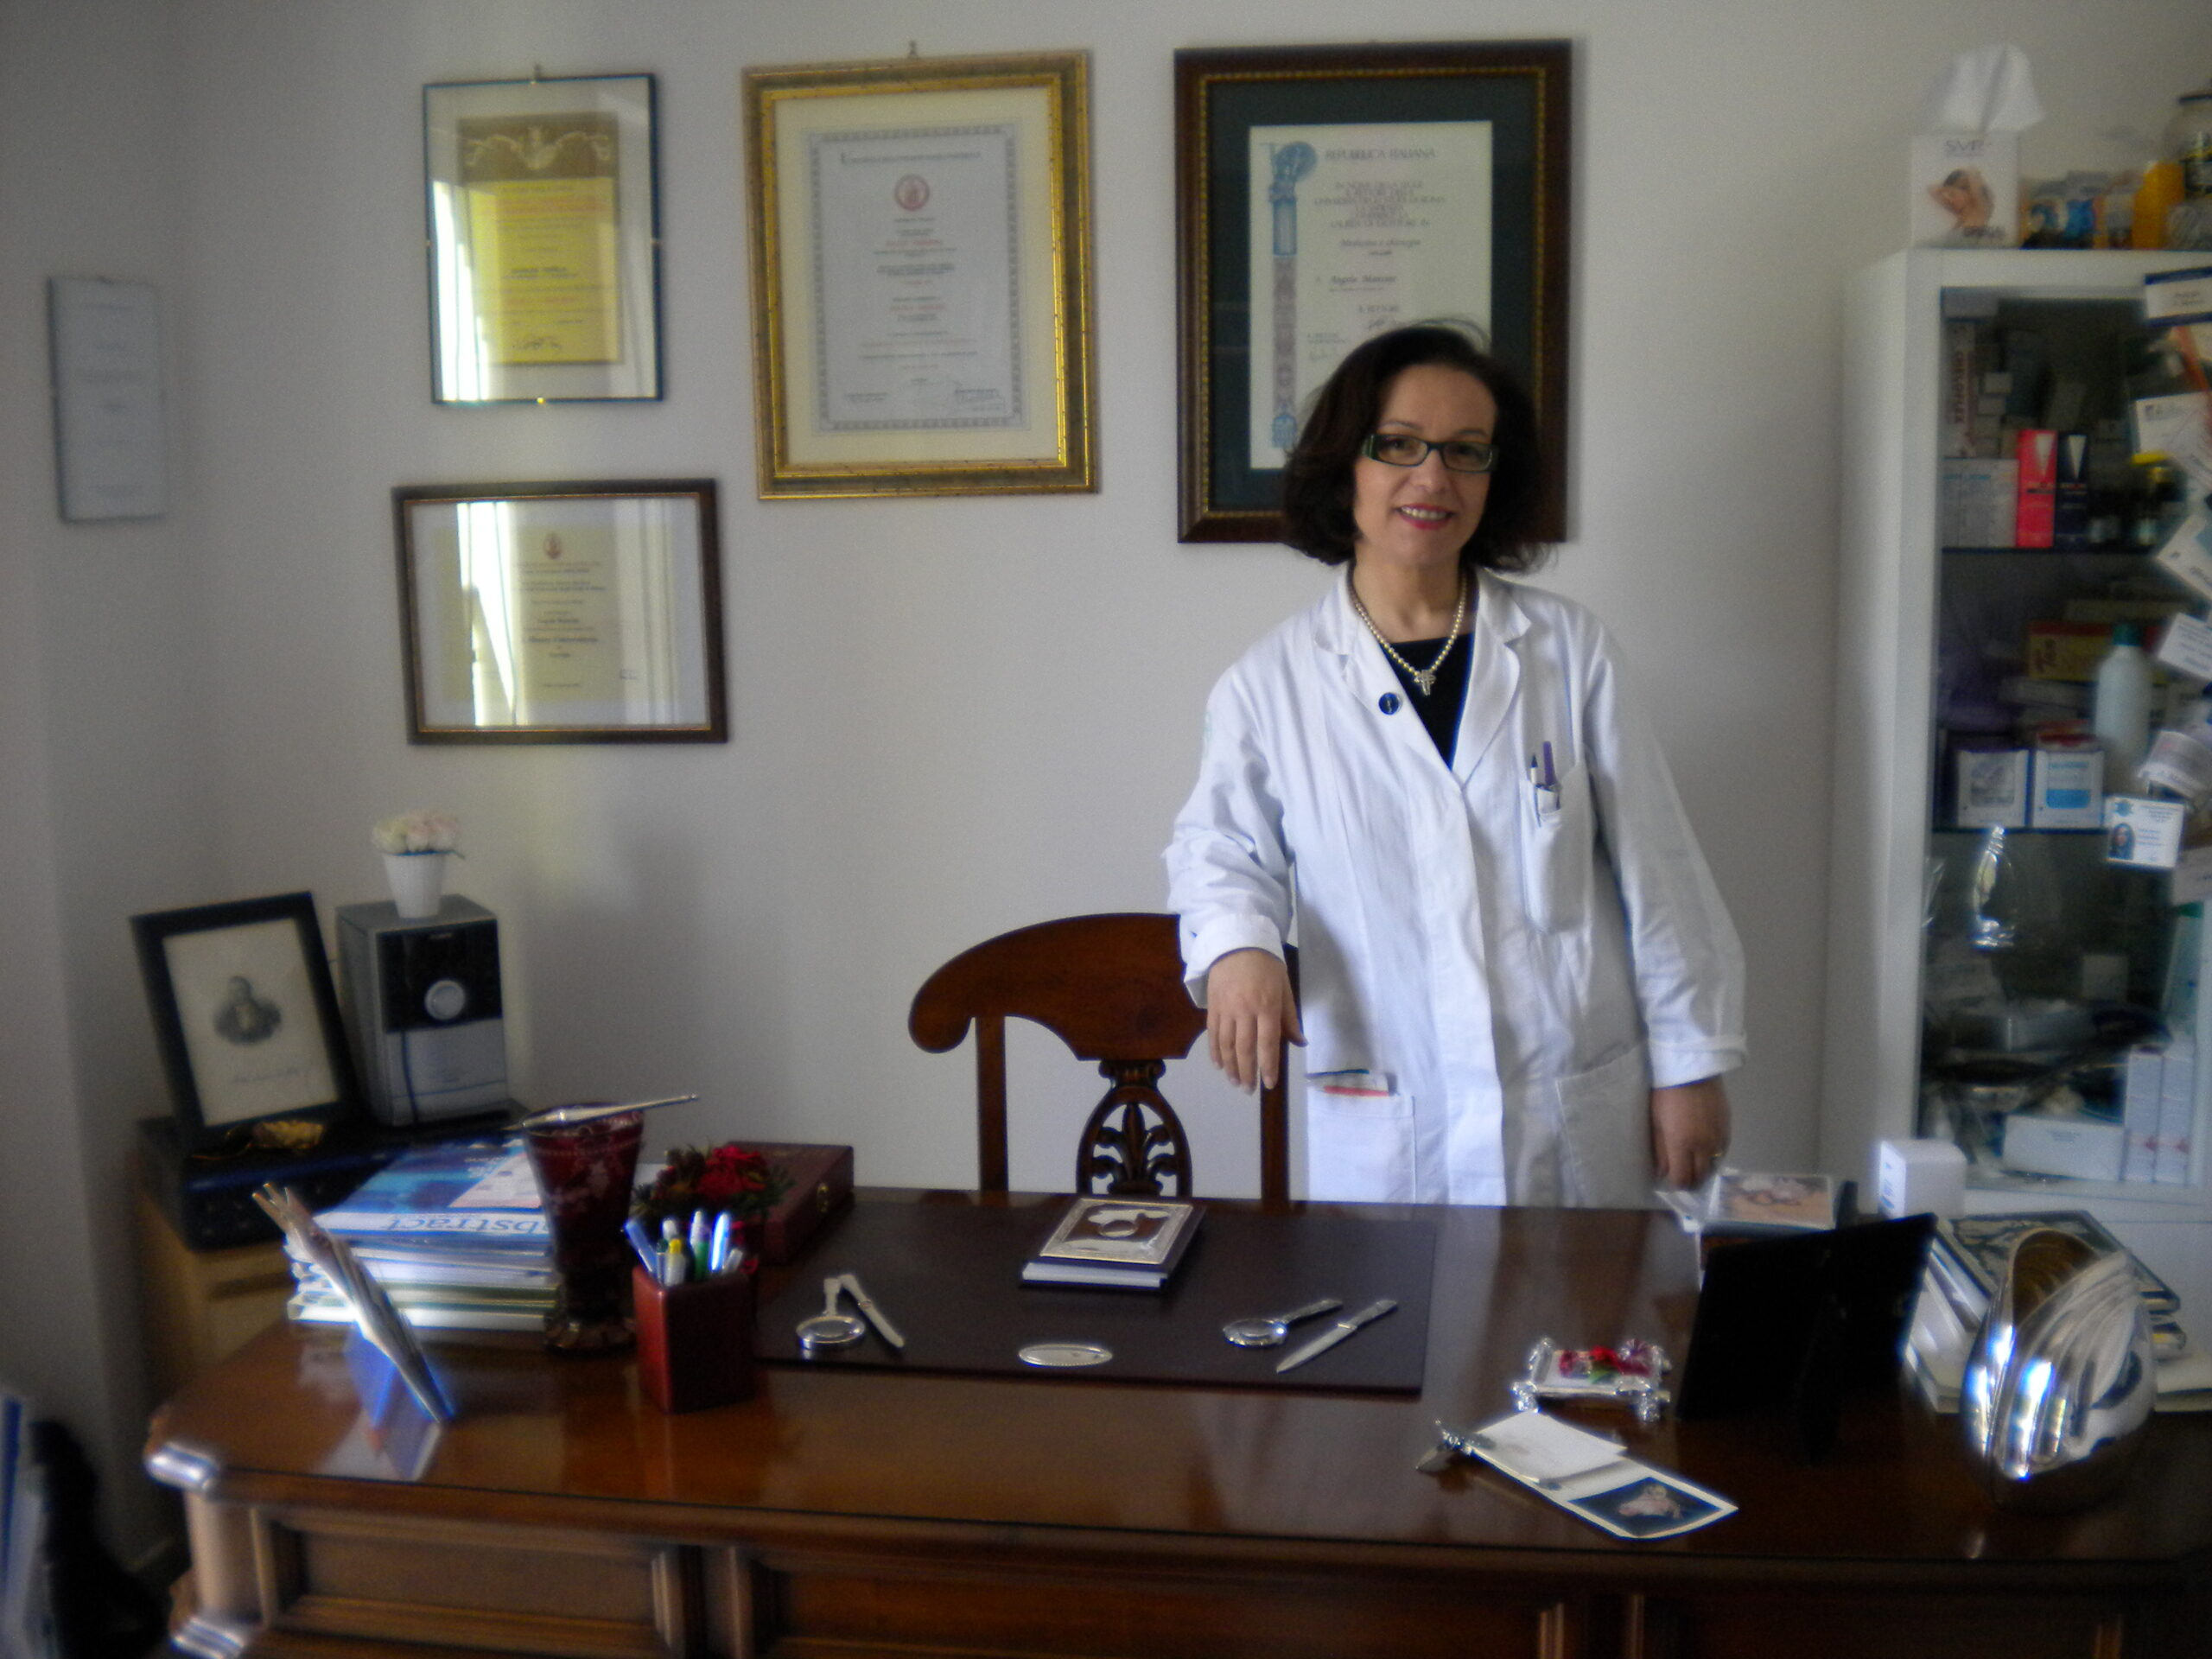 Dott.ssa Angela Mancini